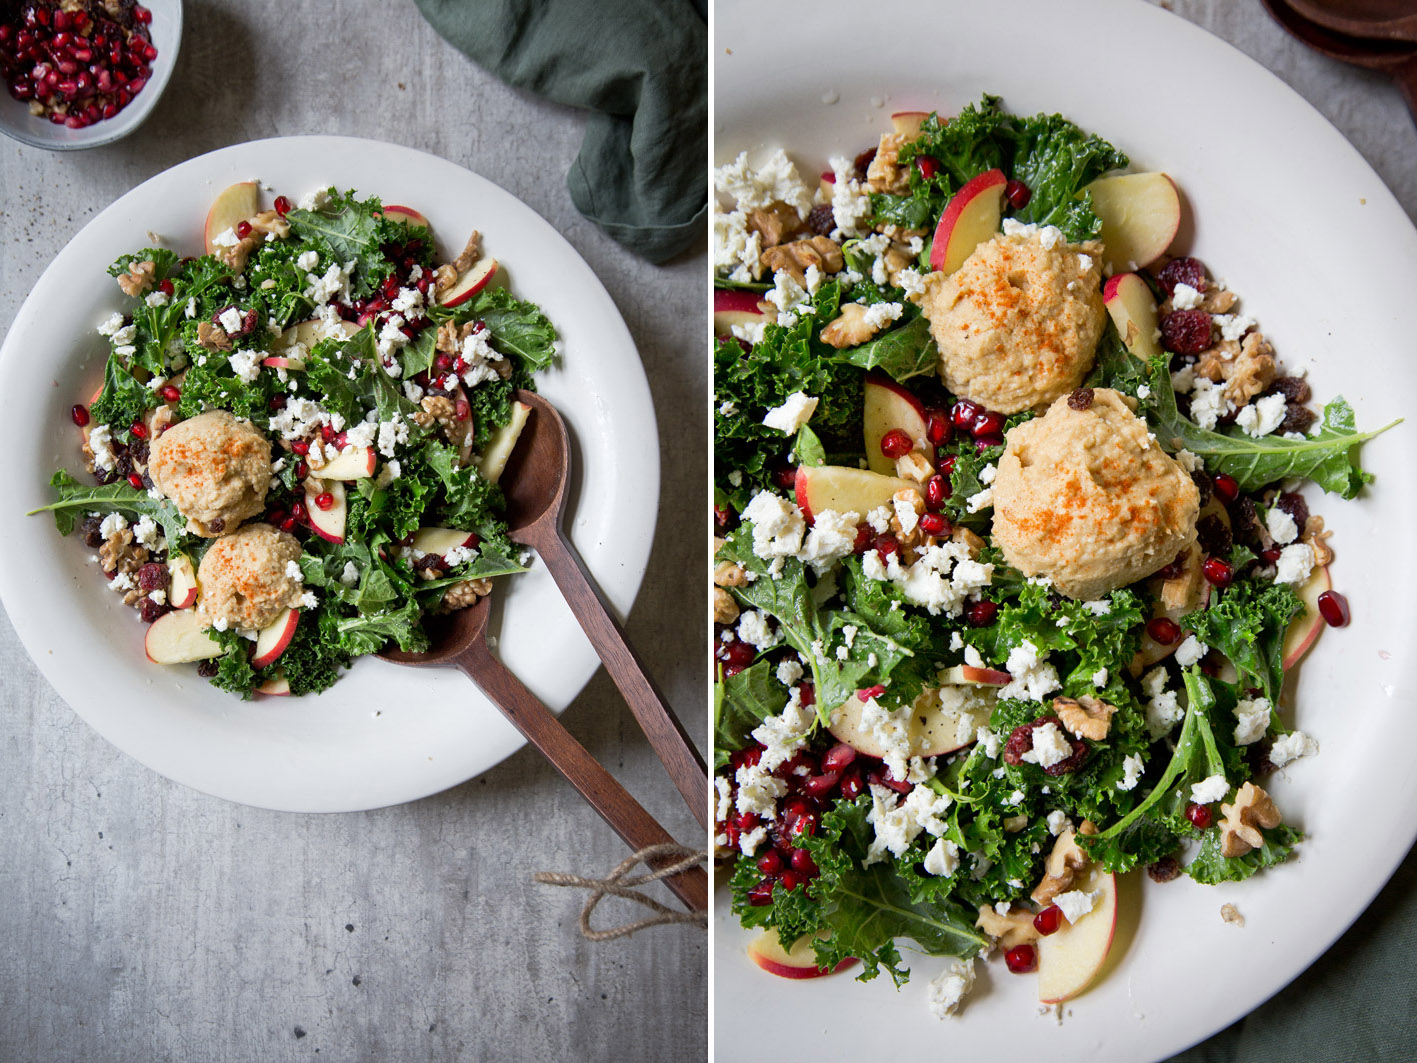 Grünkohlsalat mit Hummus